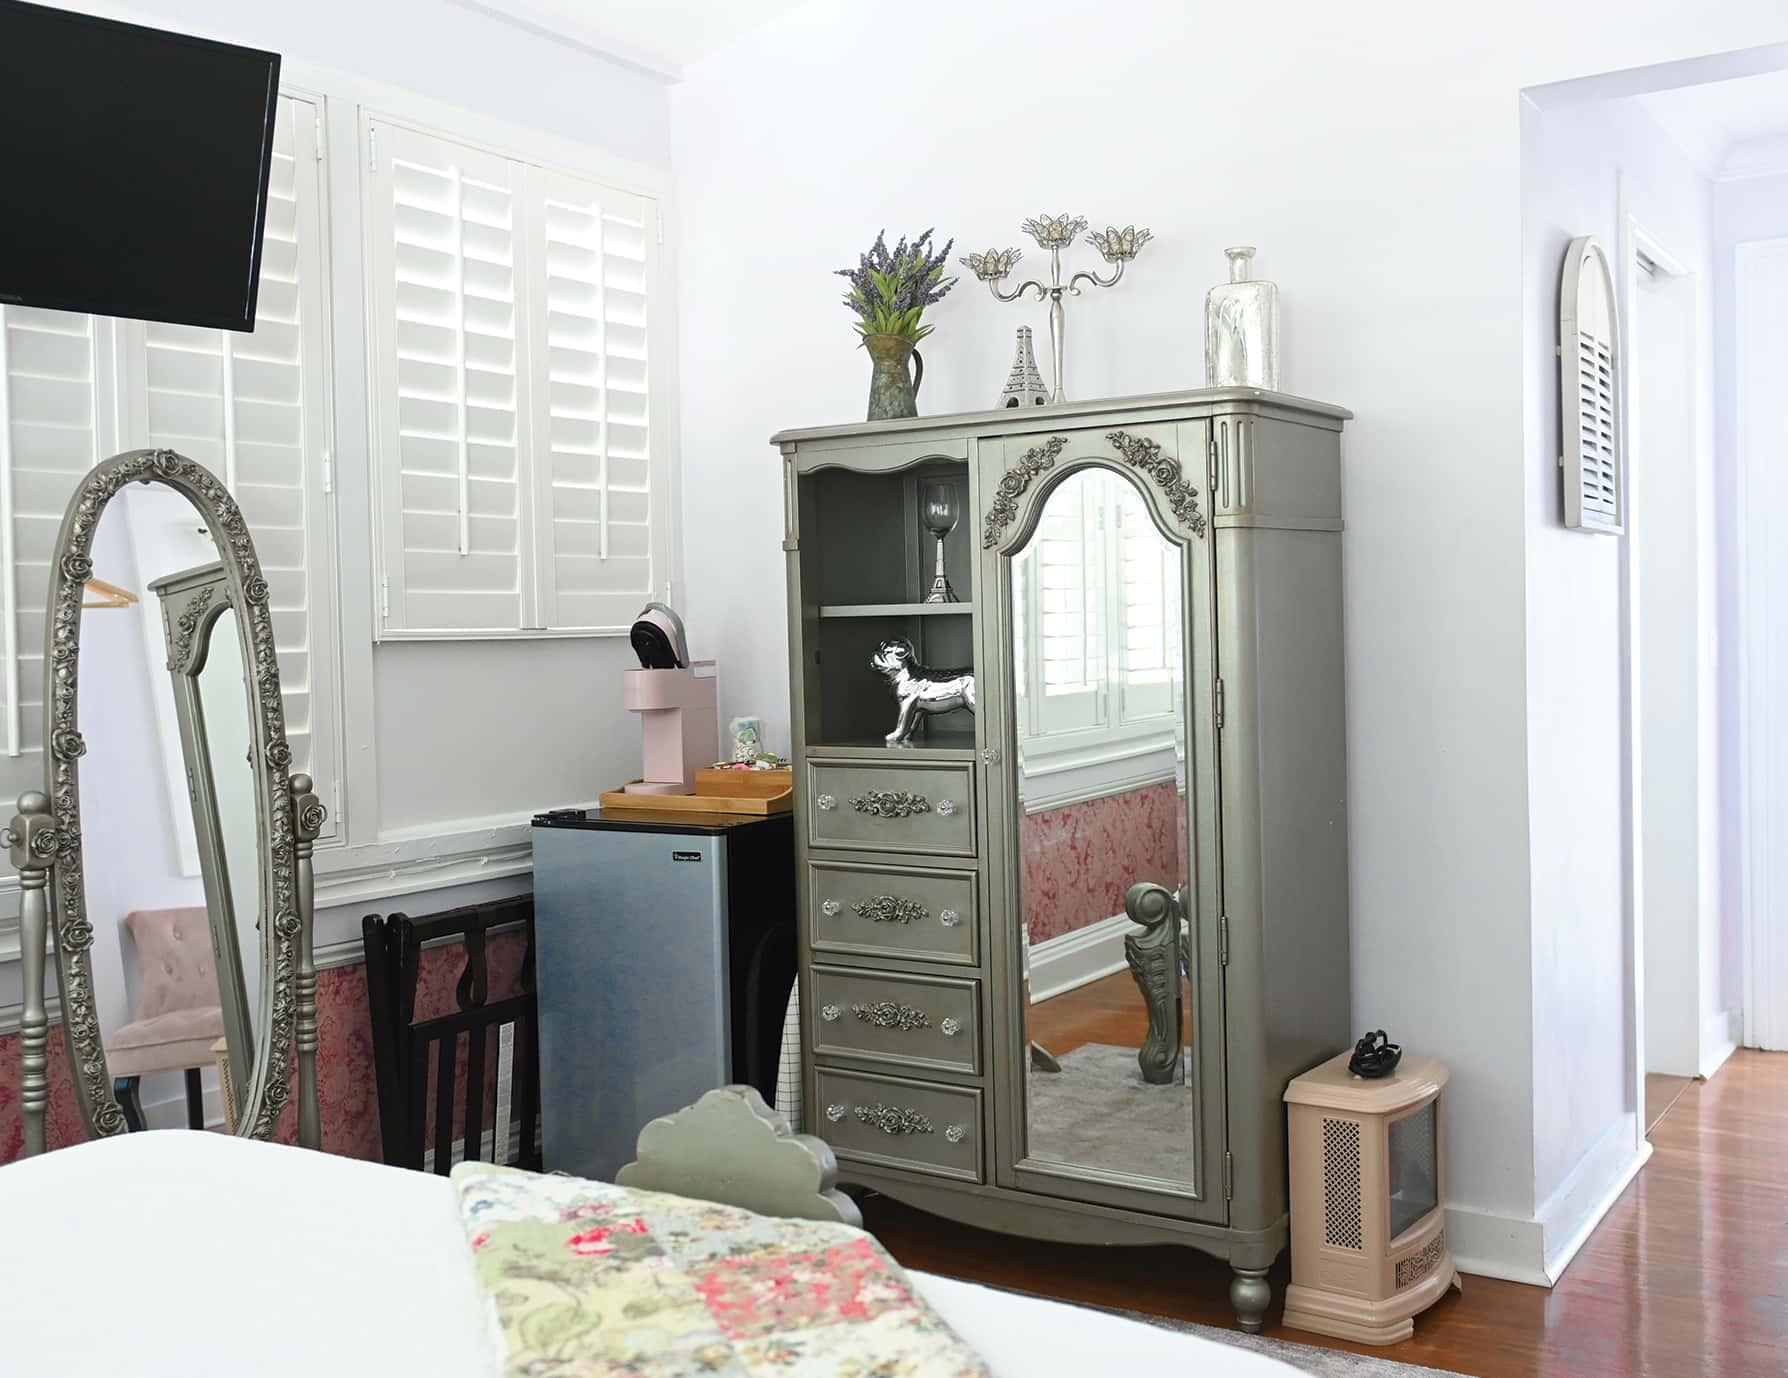 Sun Room - Romantic Key West Lodging near Old Town